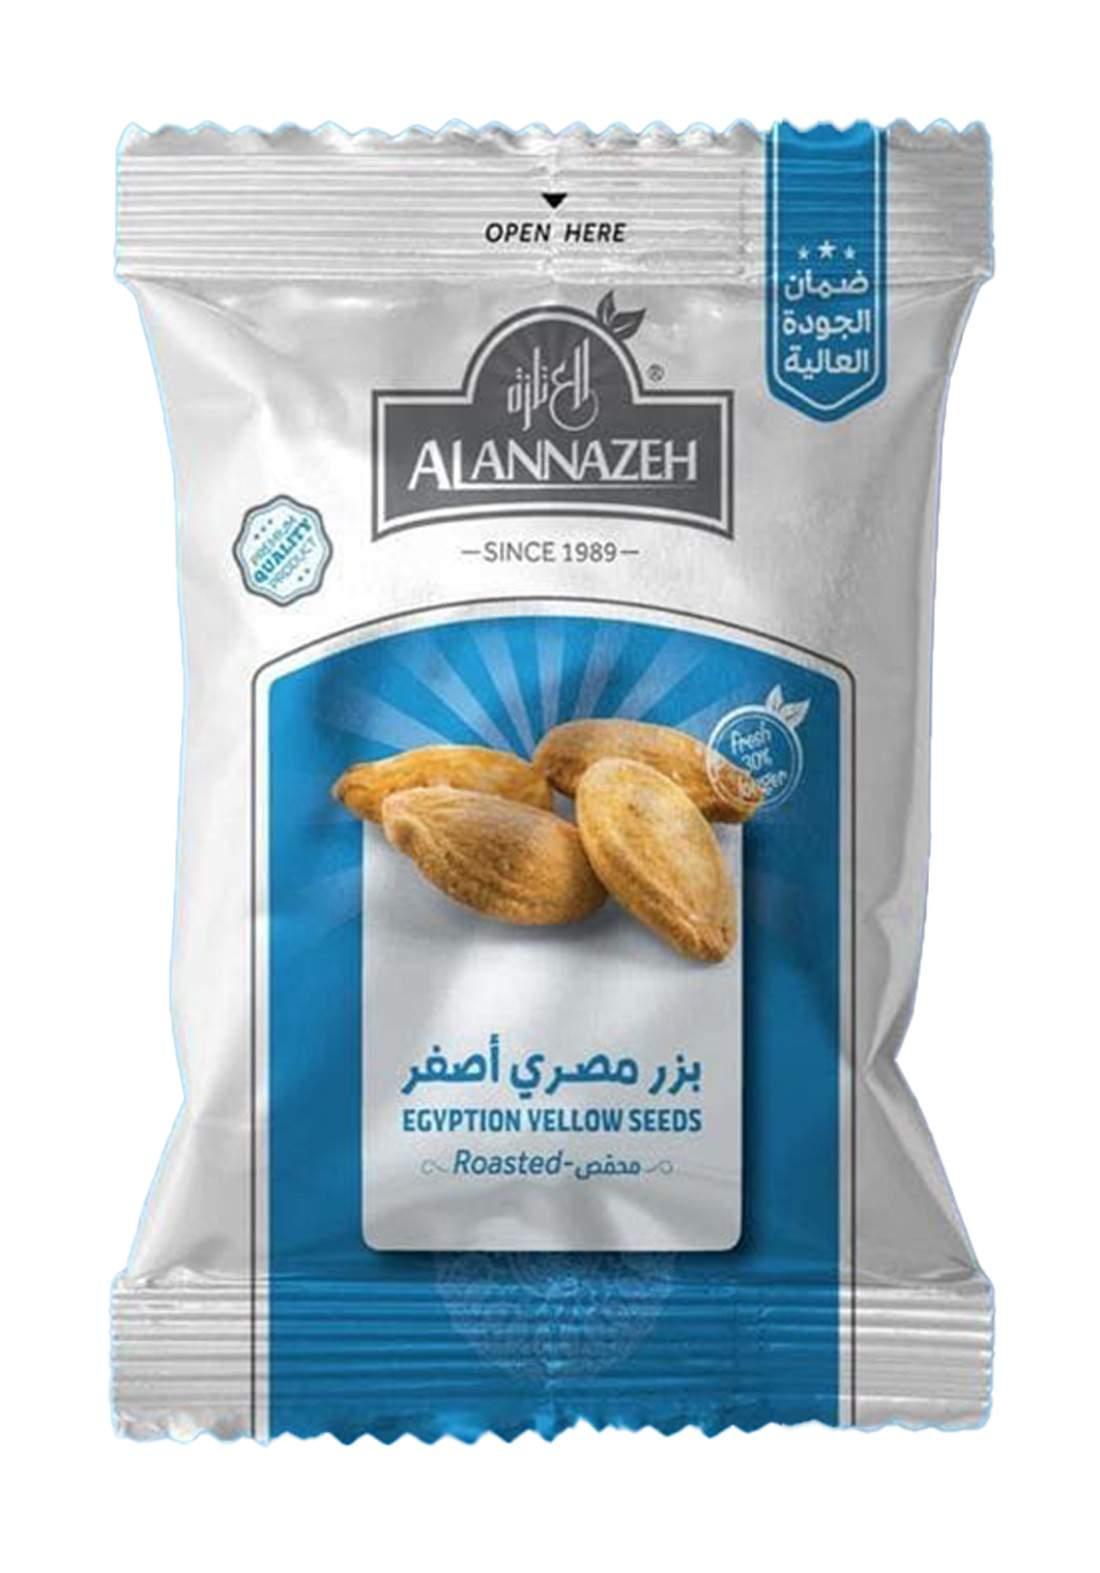 Al-Annazeh Yellow Egyptian Seeds Nuts 90g بزر مصري اصفر